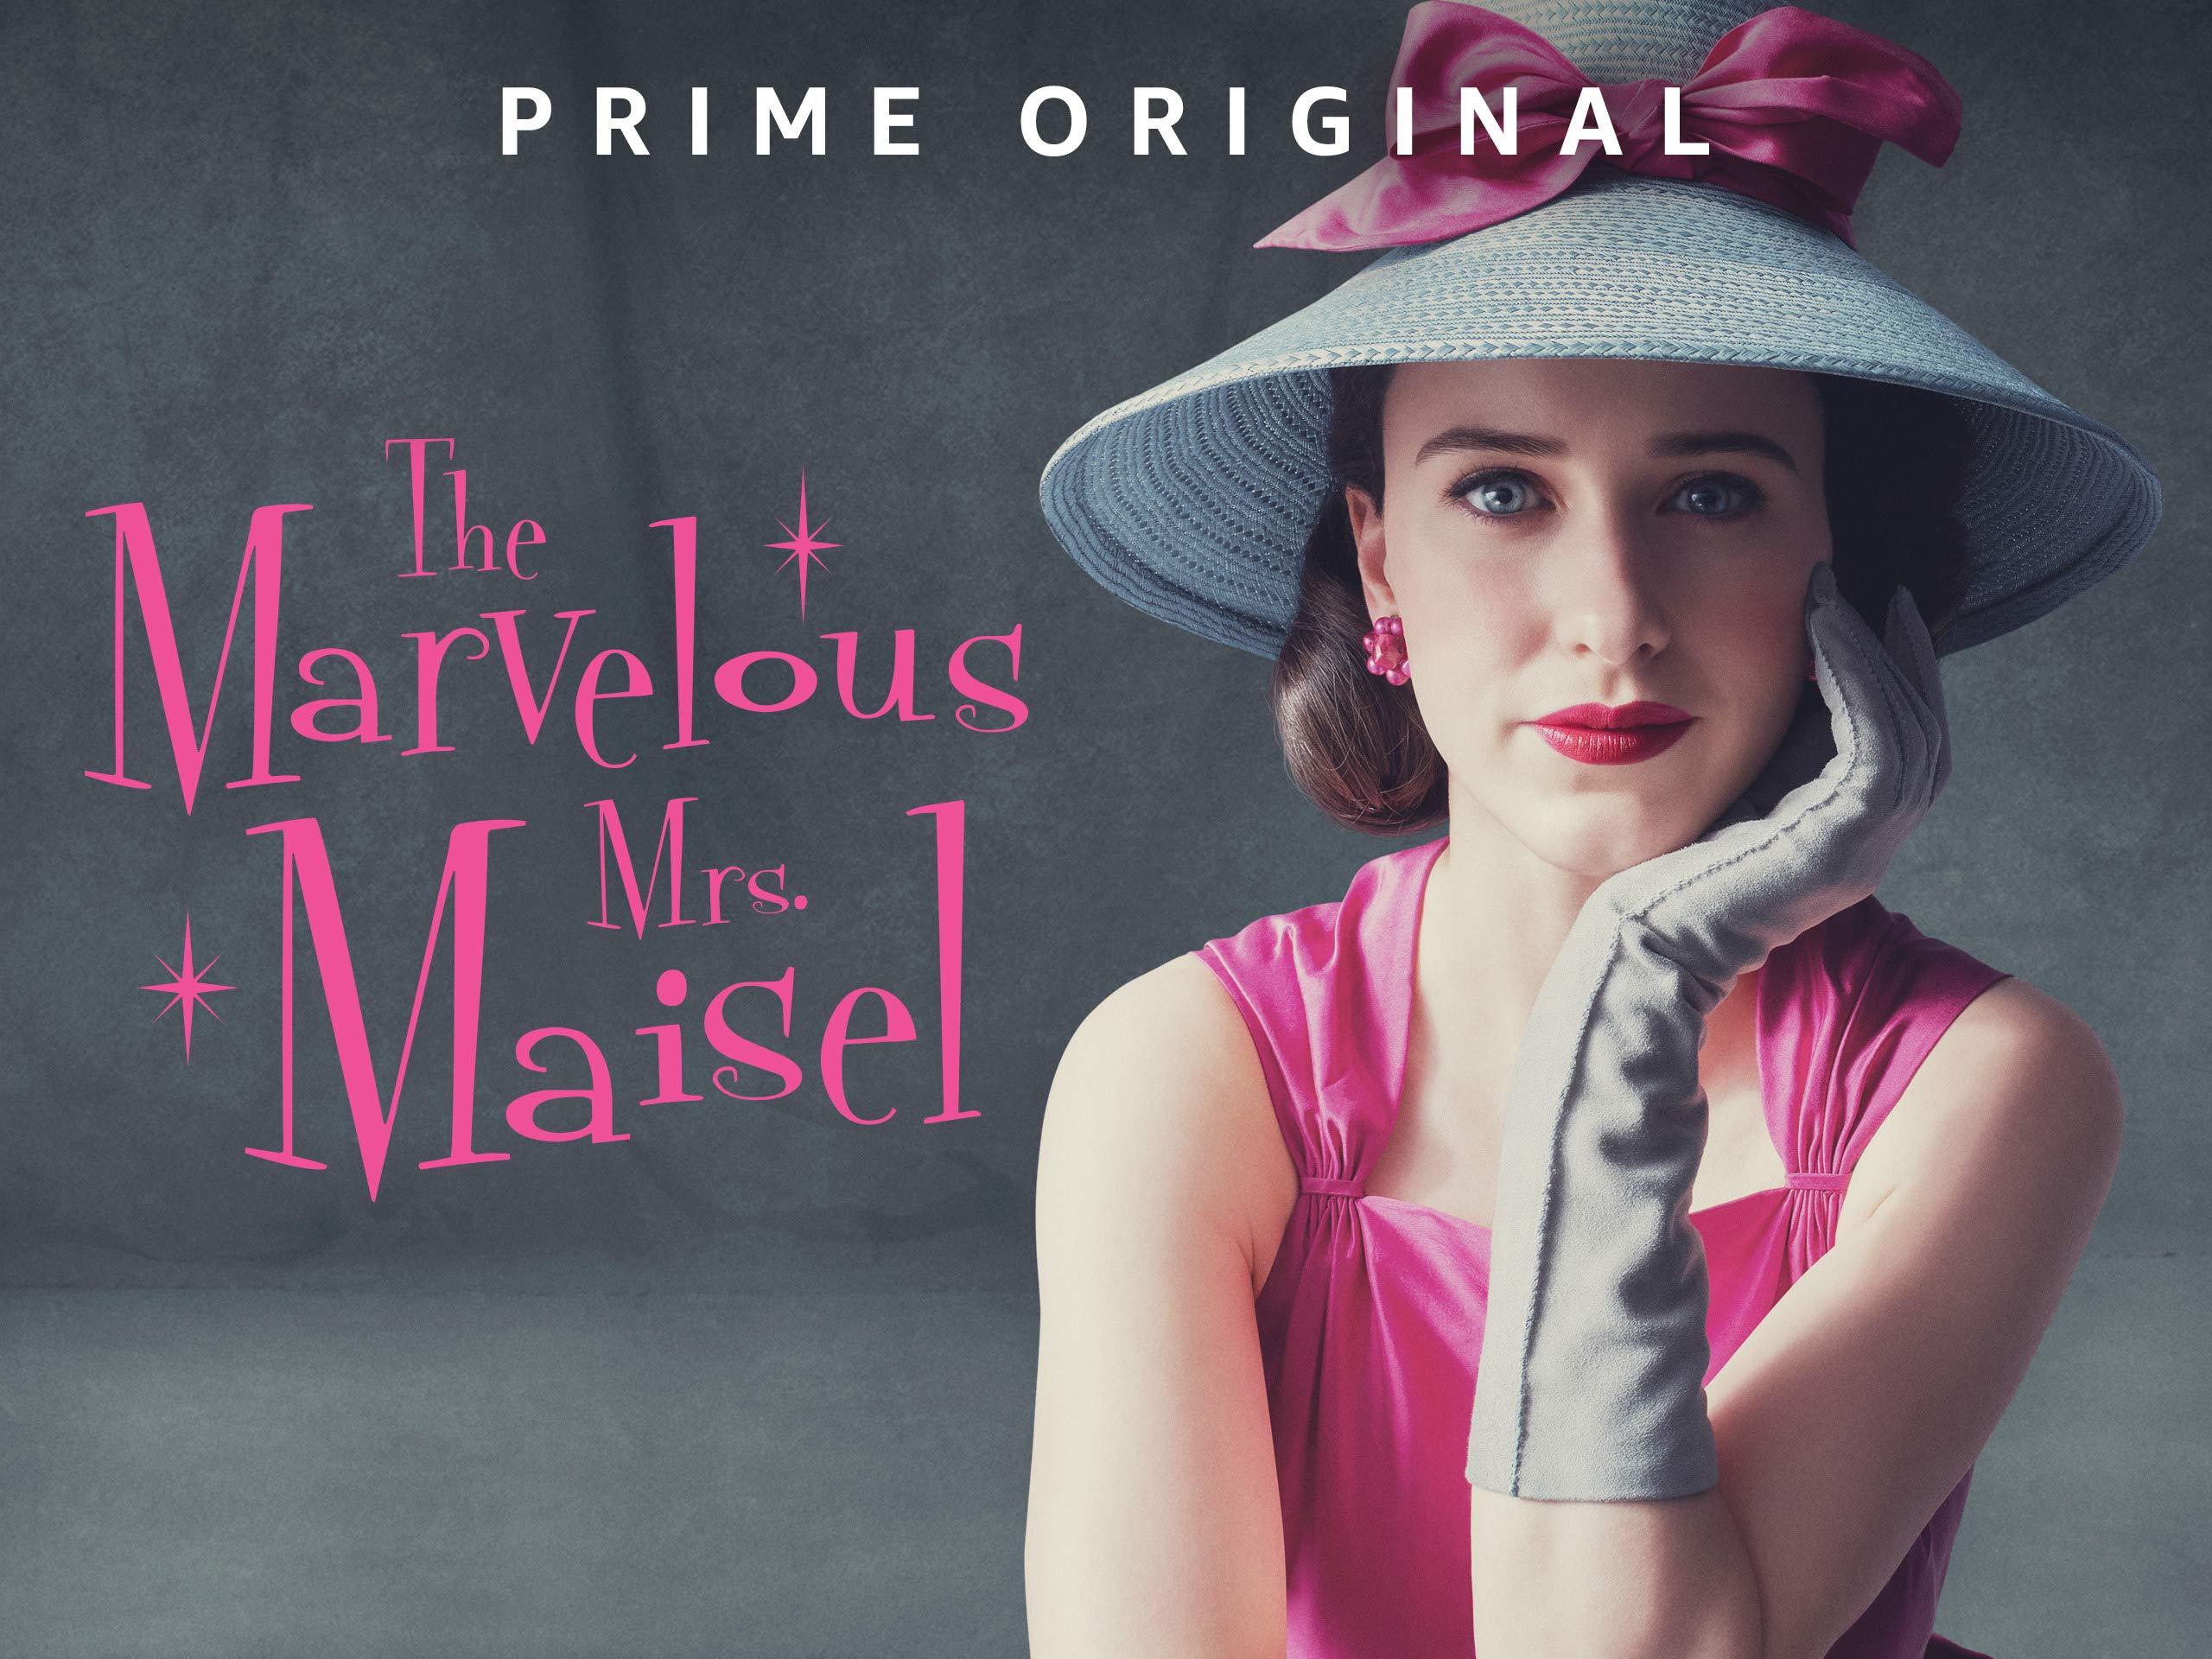 Amazon co uk: Watch The Marvelous Mrs  Maisel - Season 2 | Prime Video